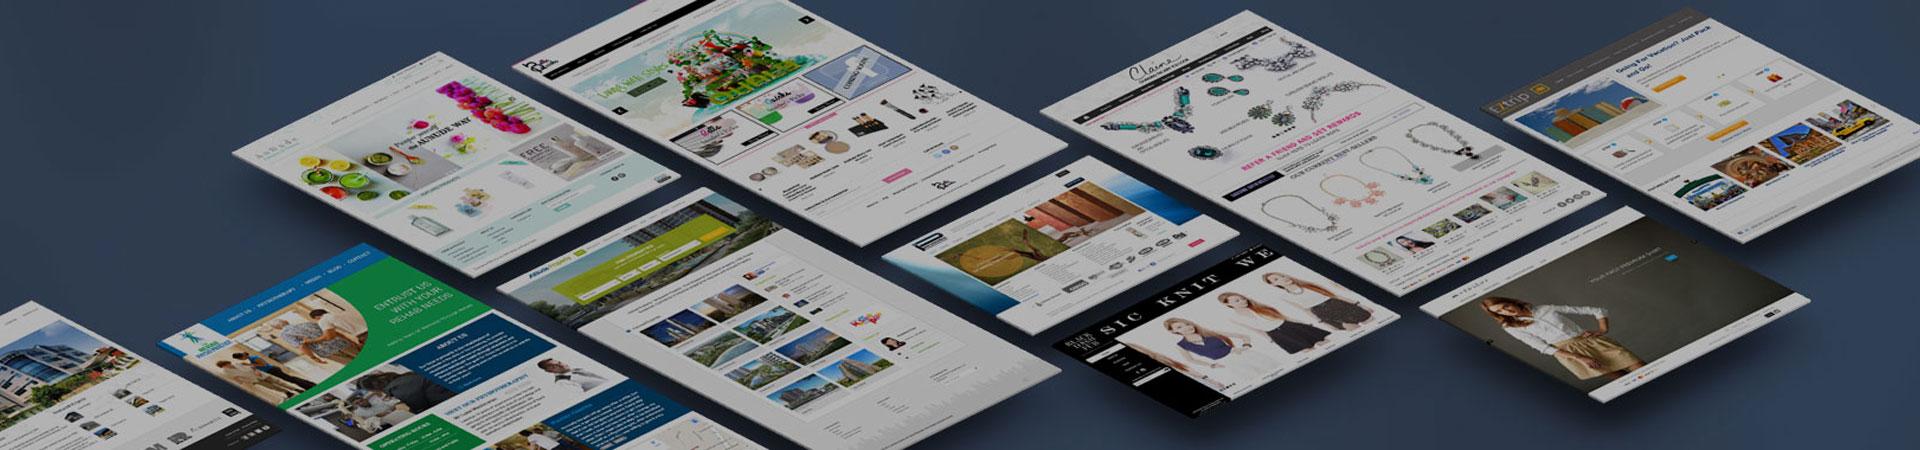 Website Design Singapore - We Are Rubbish